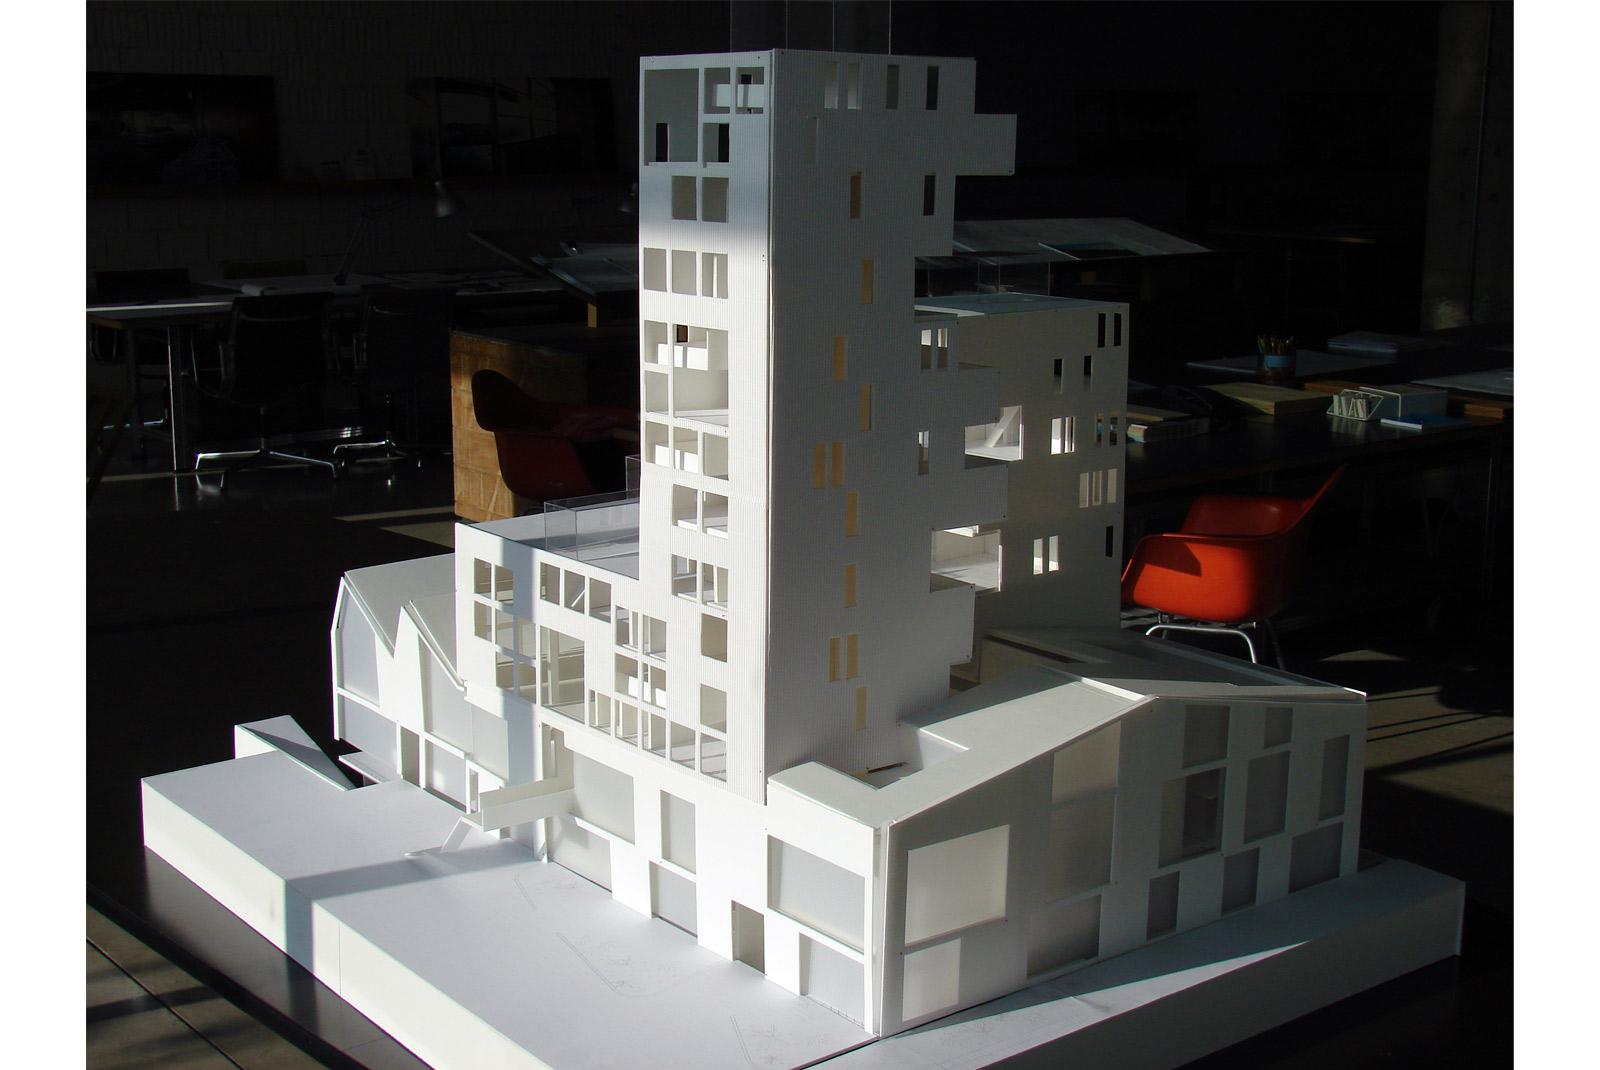 9-Viale-Toscana-model-view-2.jpg